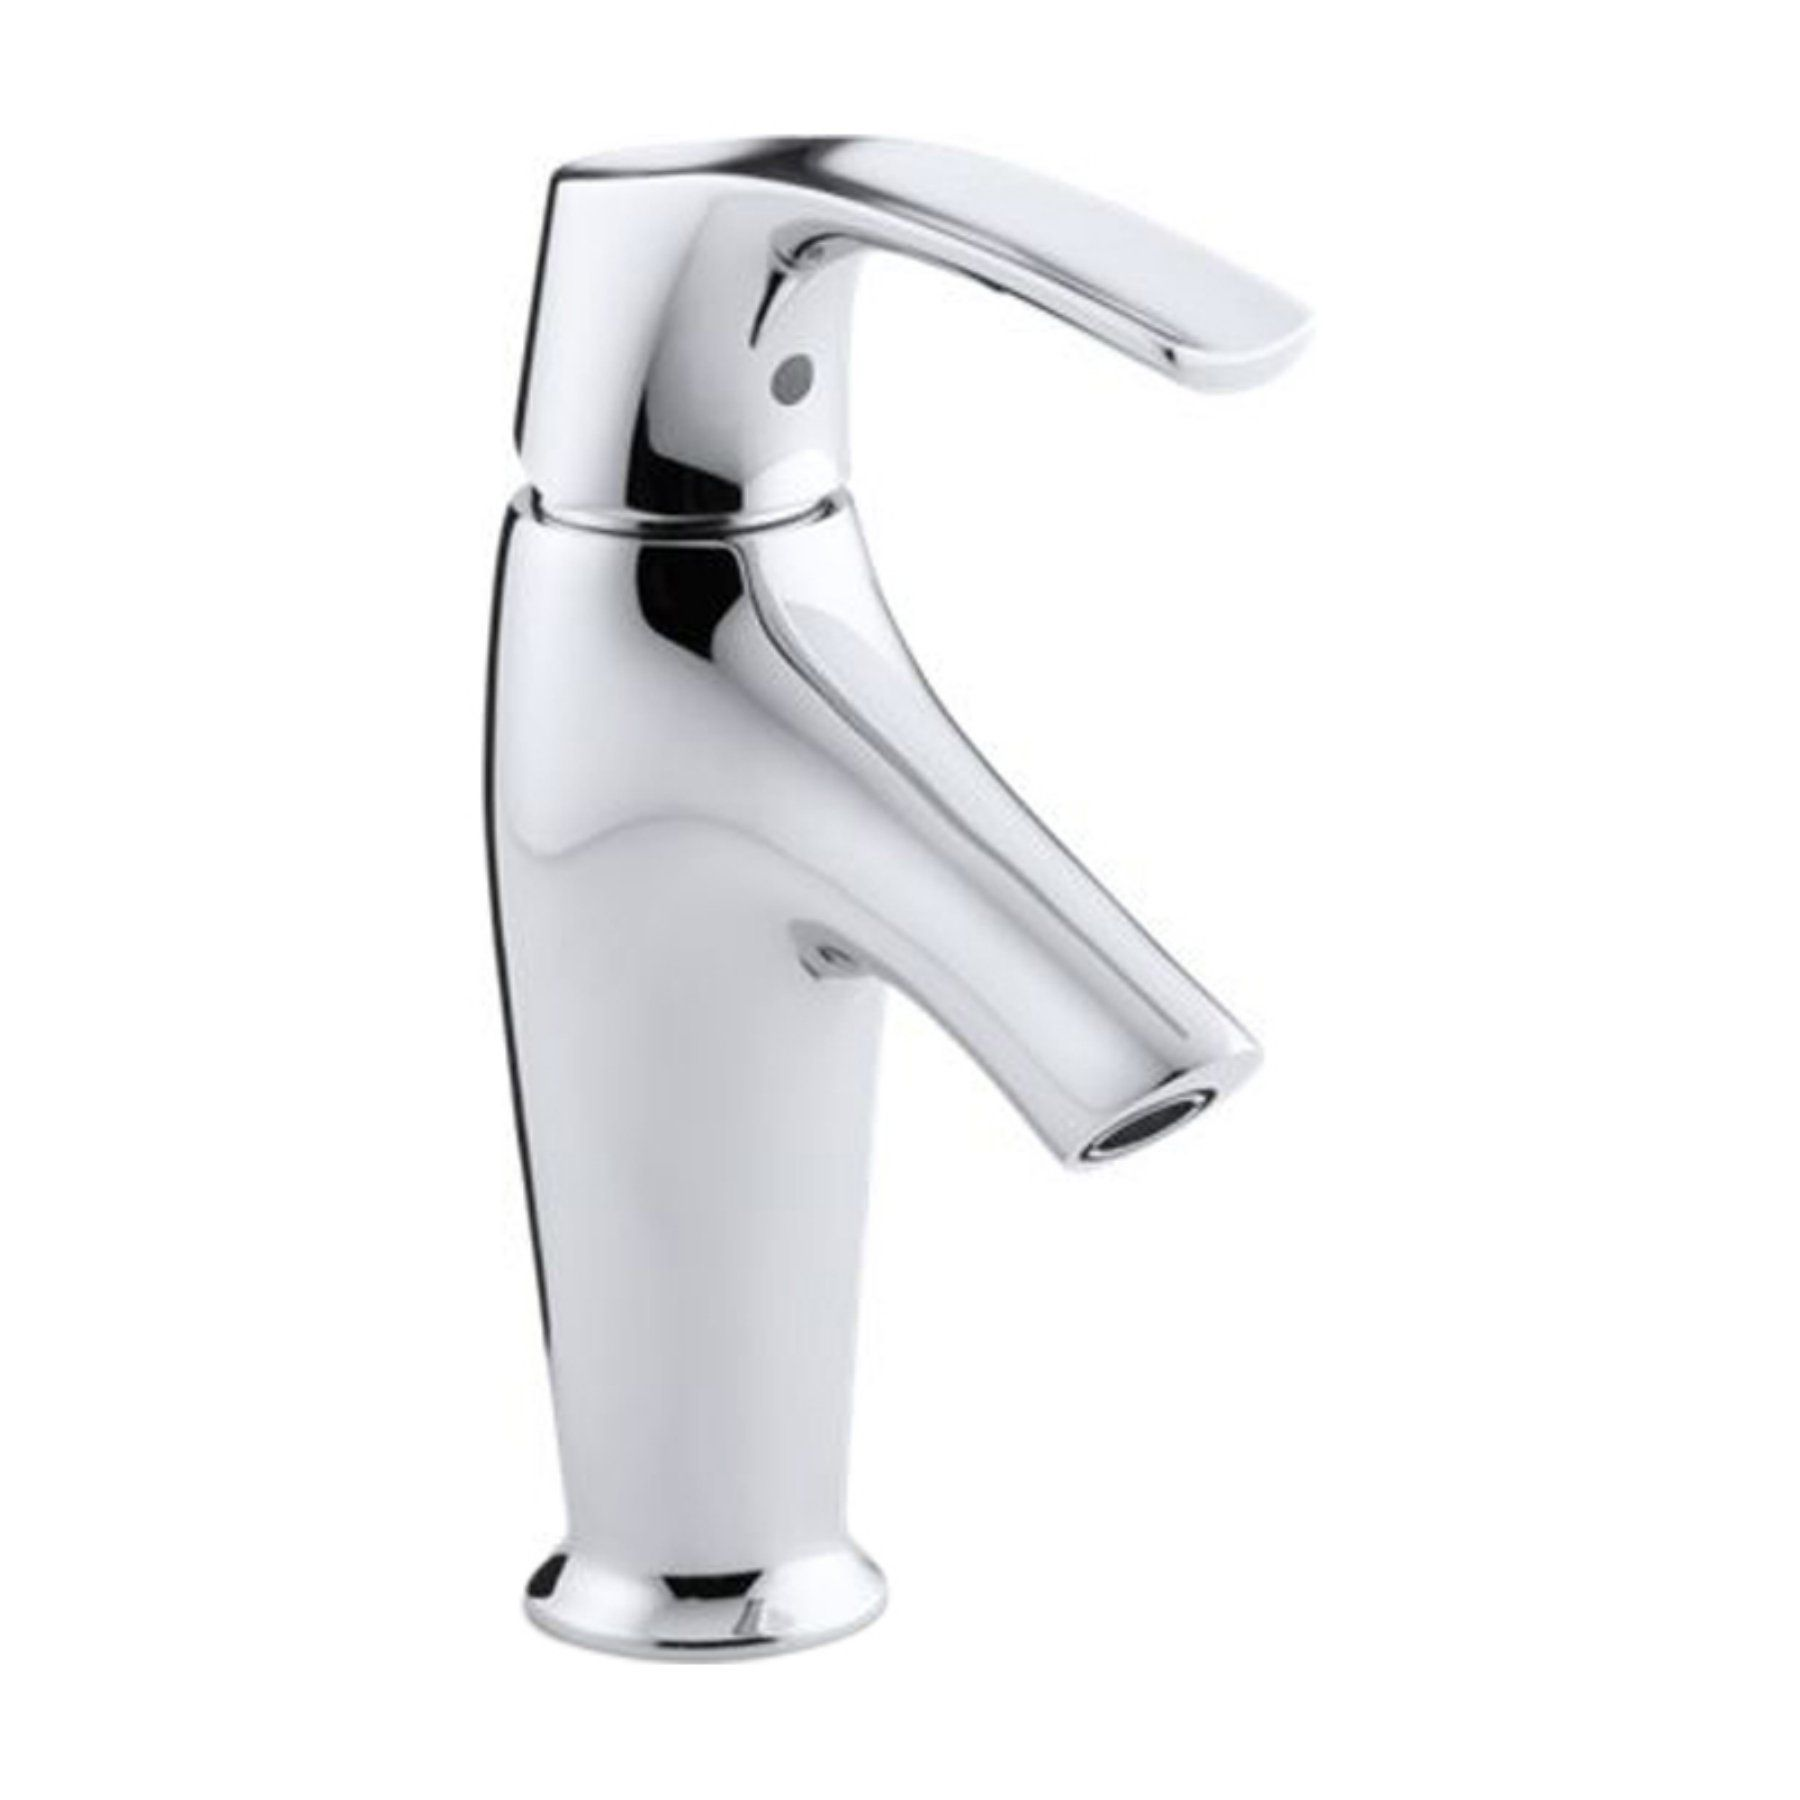 Kohler Symbol Single Handle Bathroom Sink Faucet Bathroom Sink